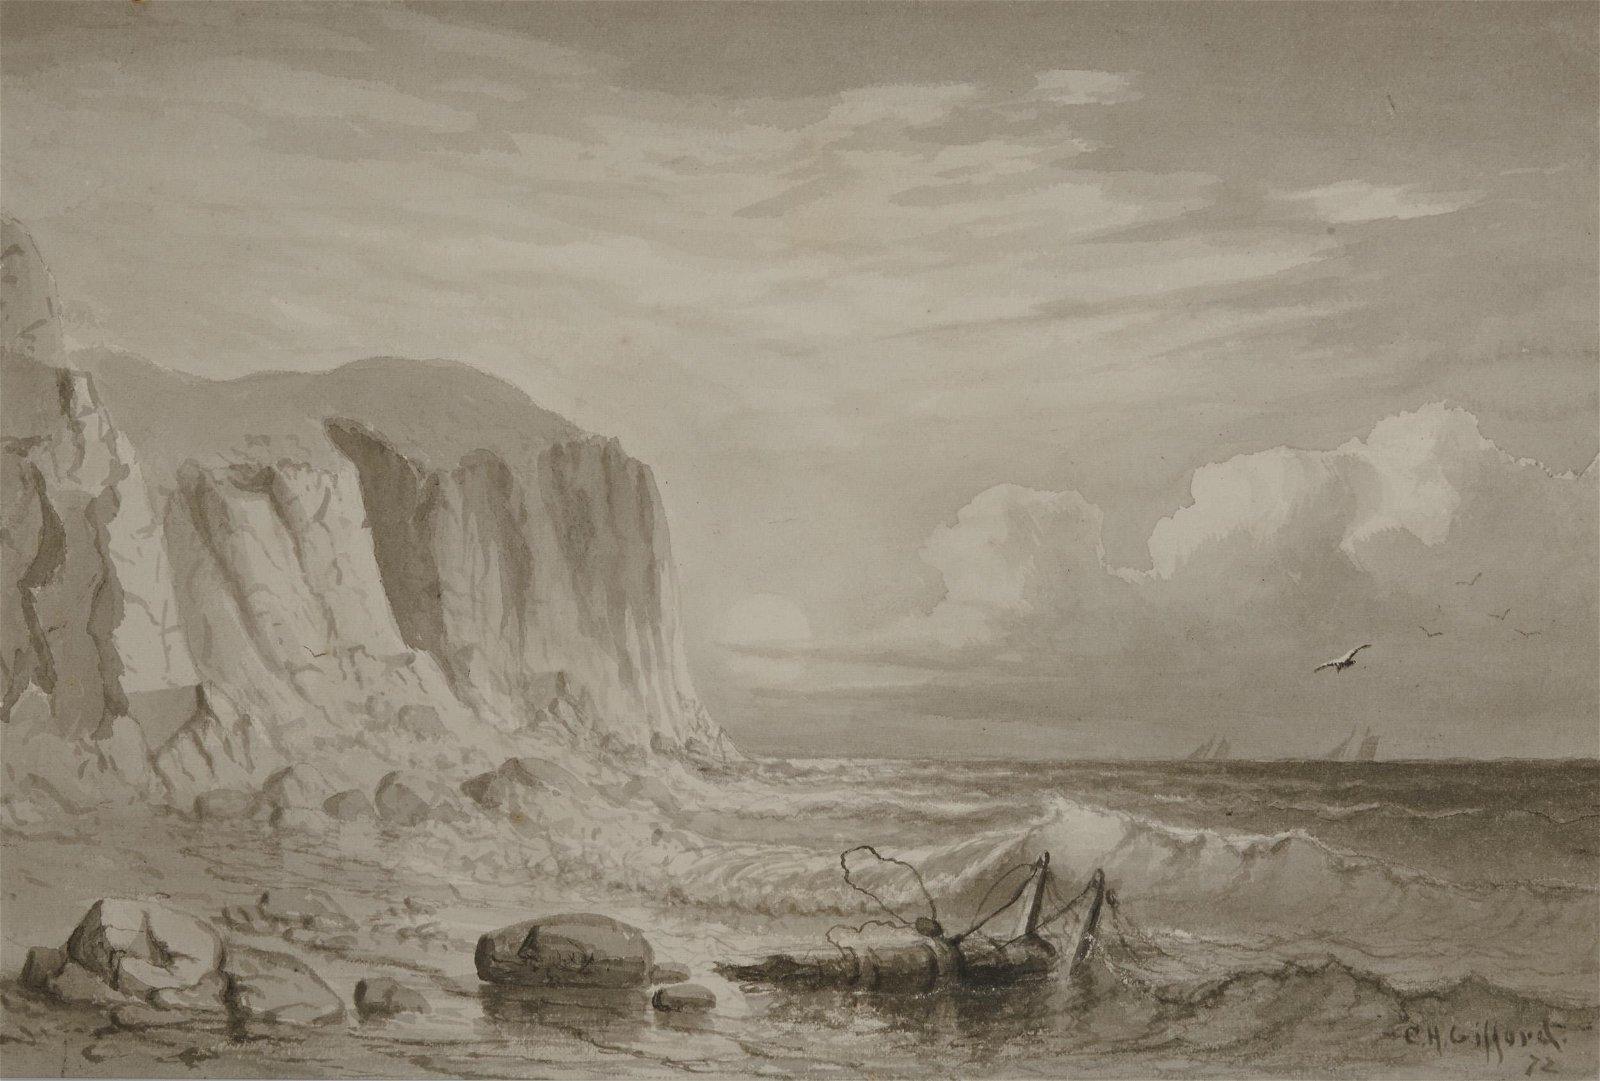 CHARLES HENRY GIFFORD, (American, 1839-1904), Rocky